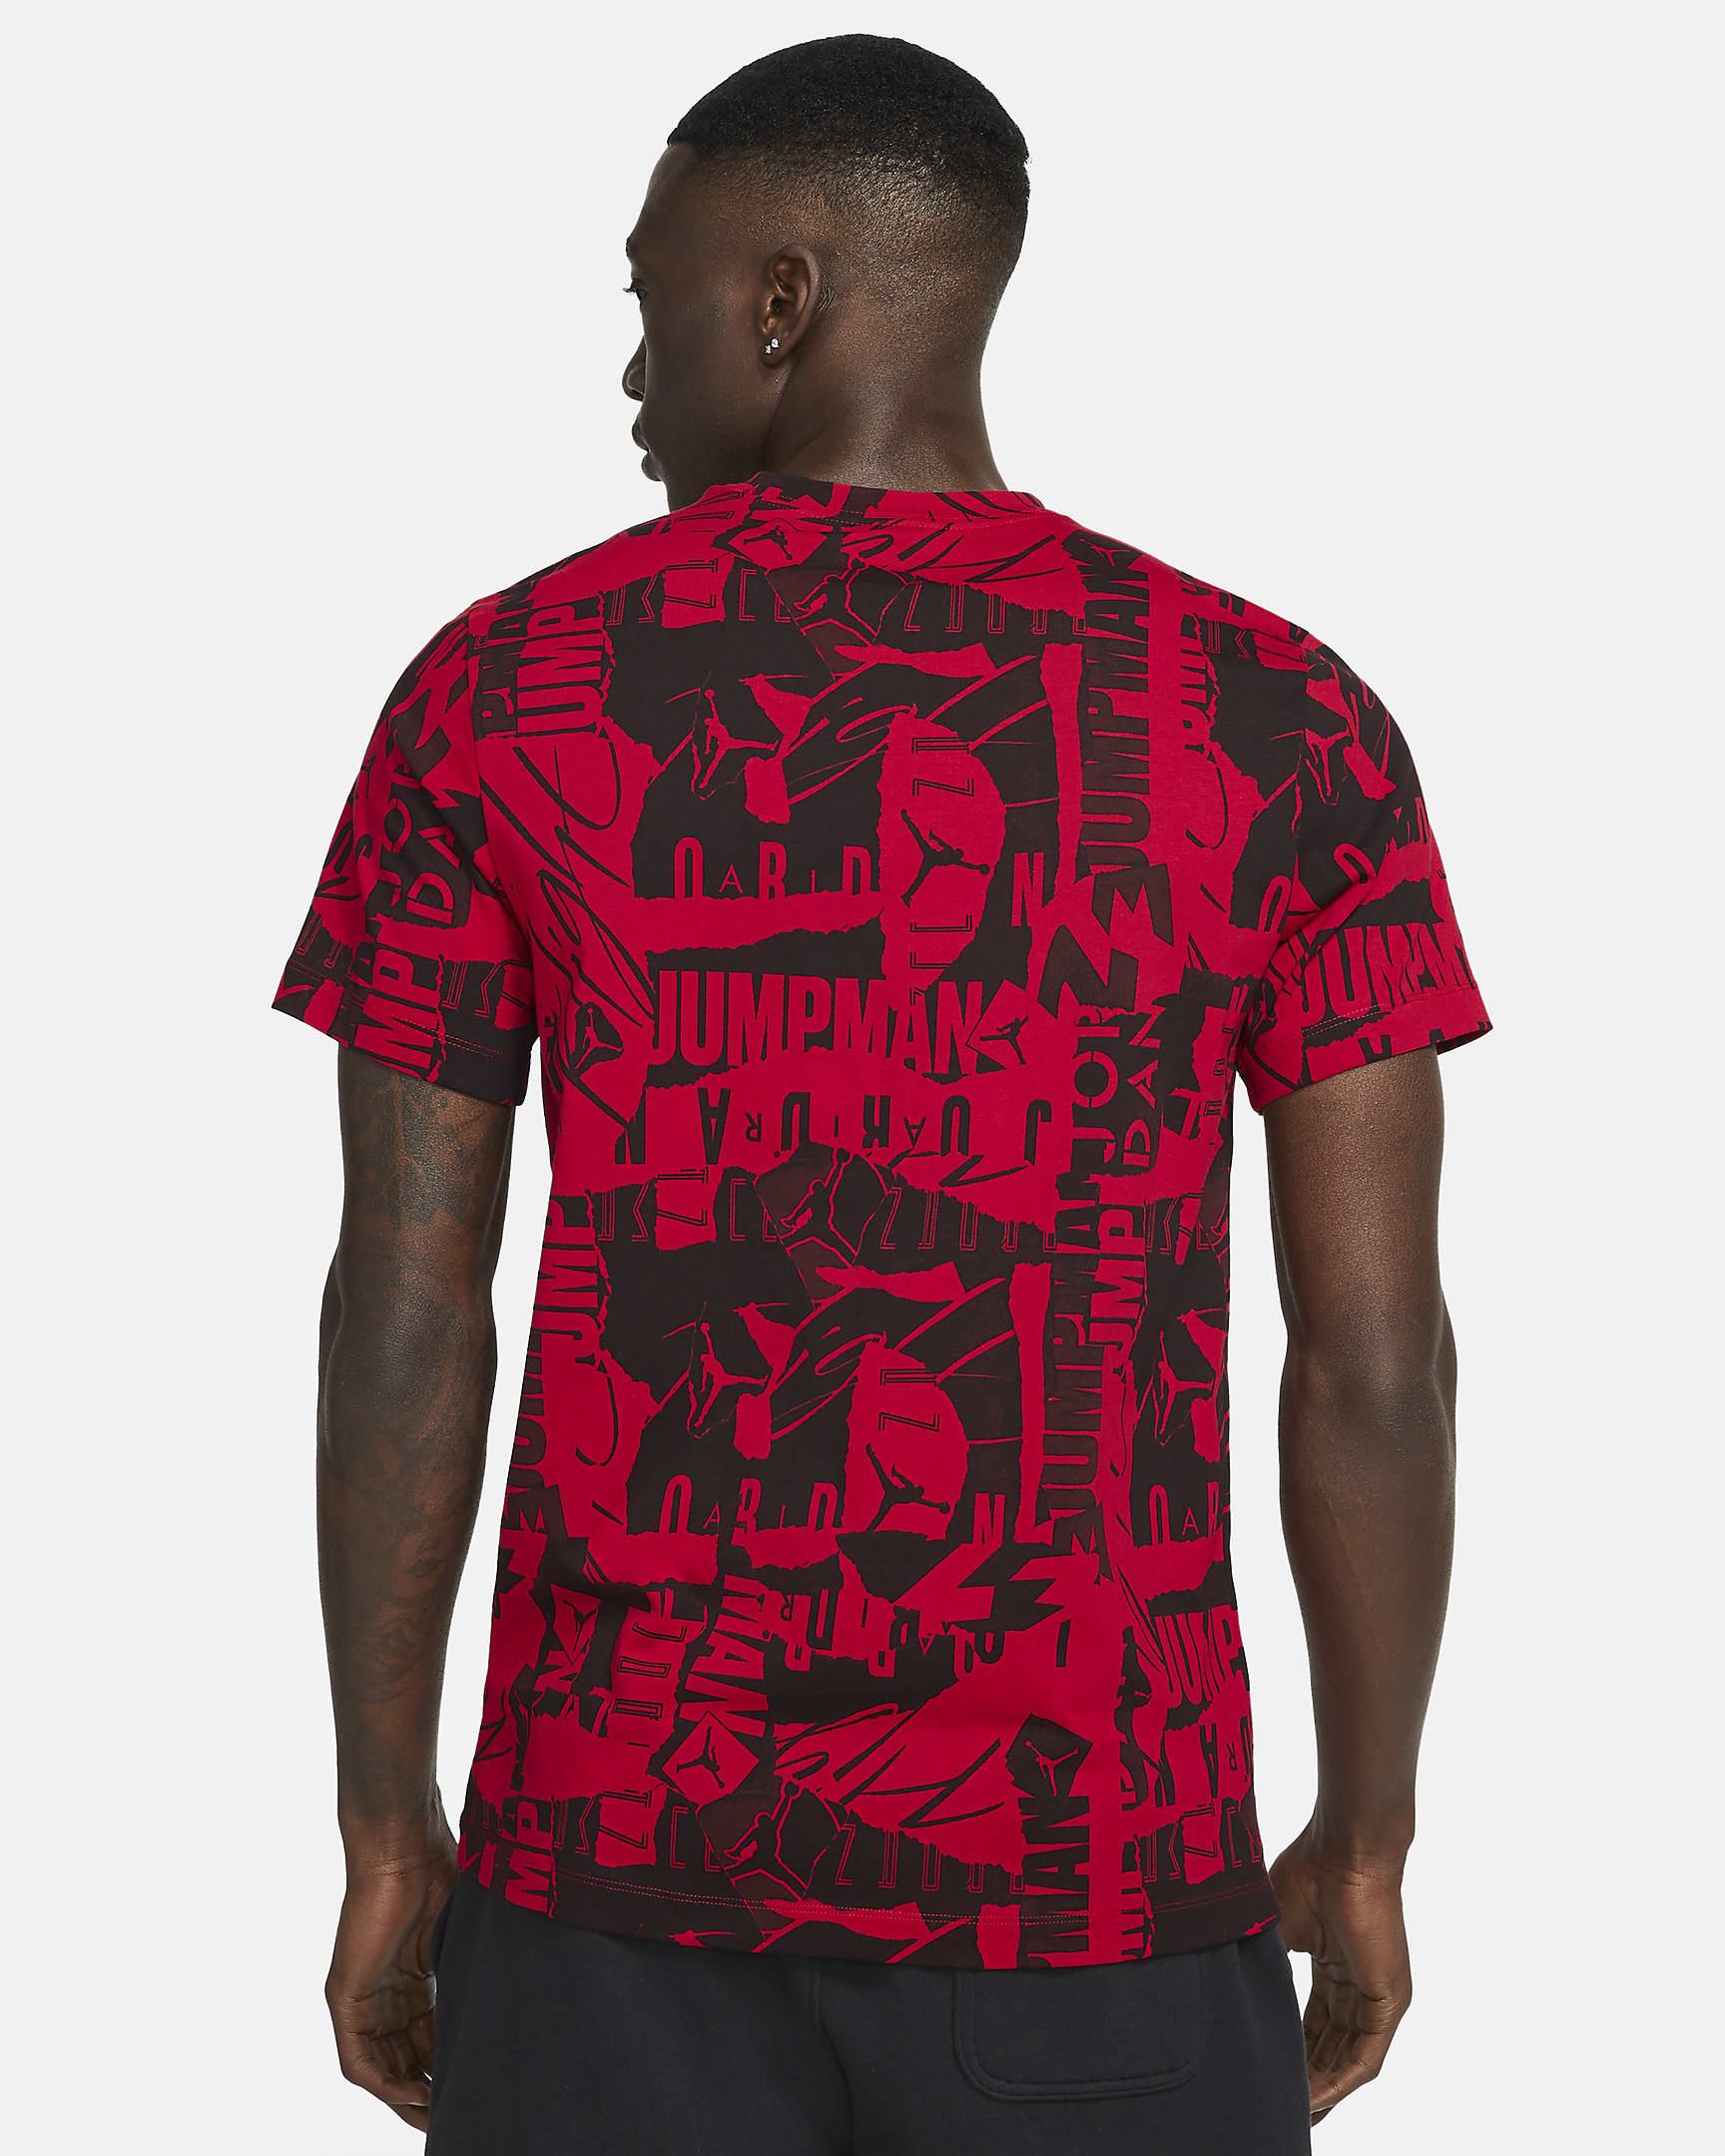 jordan-jumpman-flight-all-over-printed-short-sleeve-t-shirt-tbdHrZ-1.png